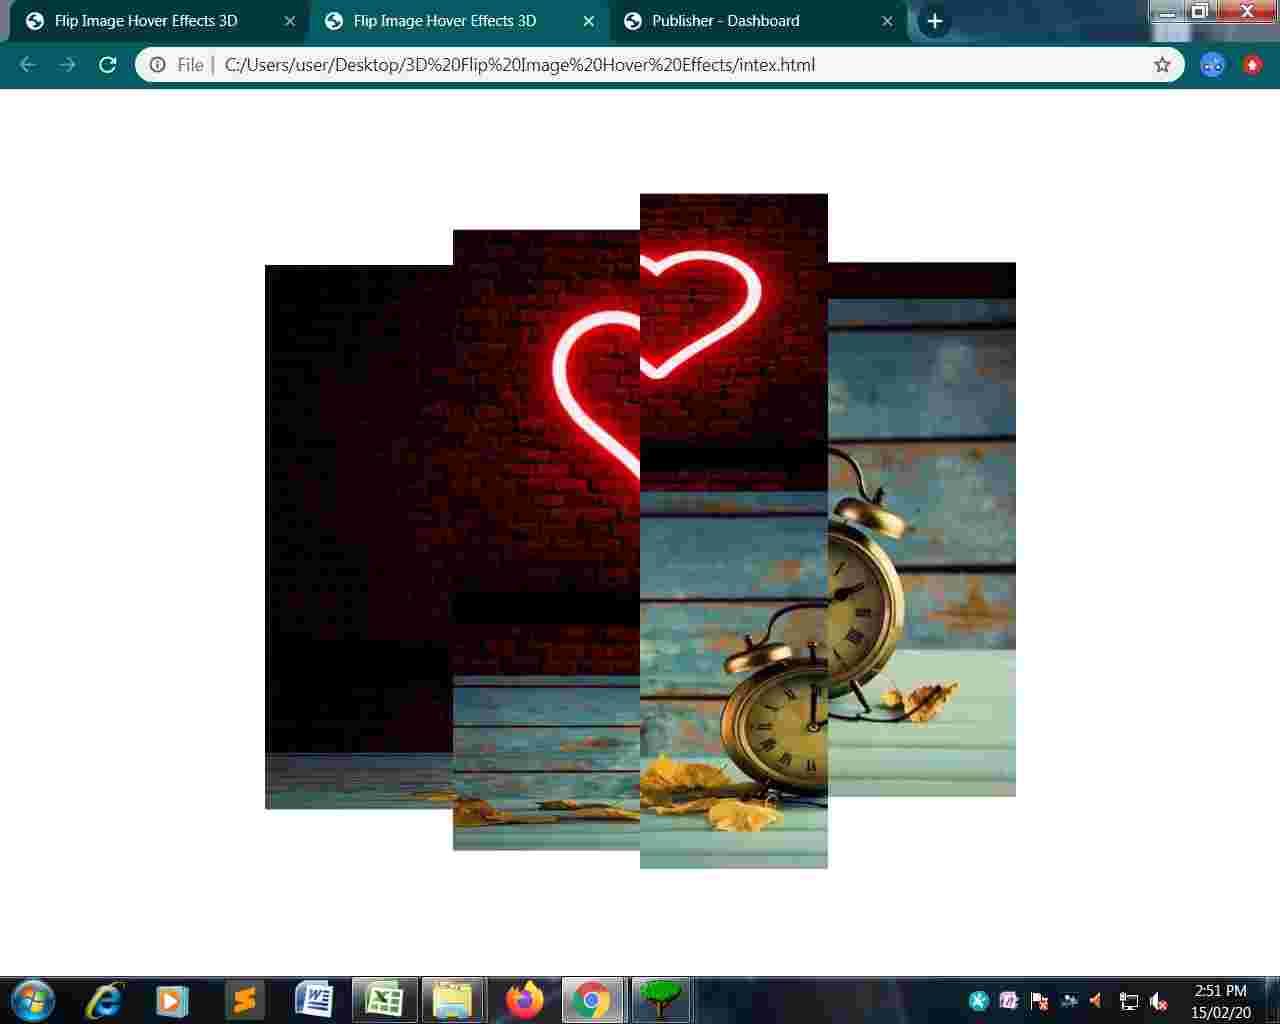 Flip Image Hover 3D Effects